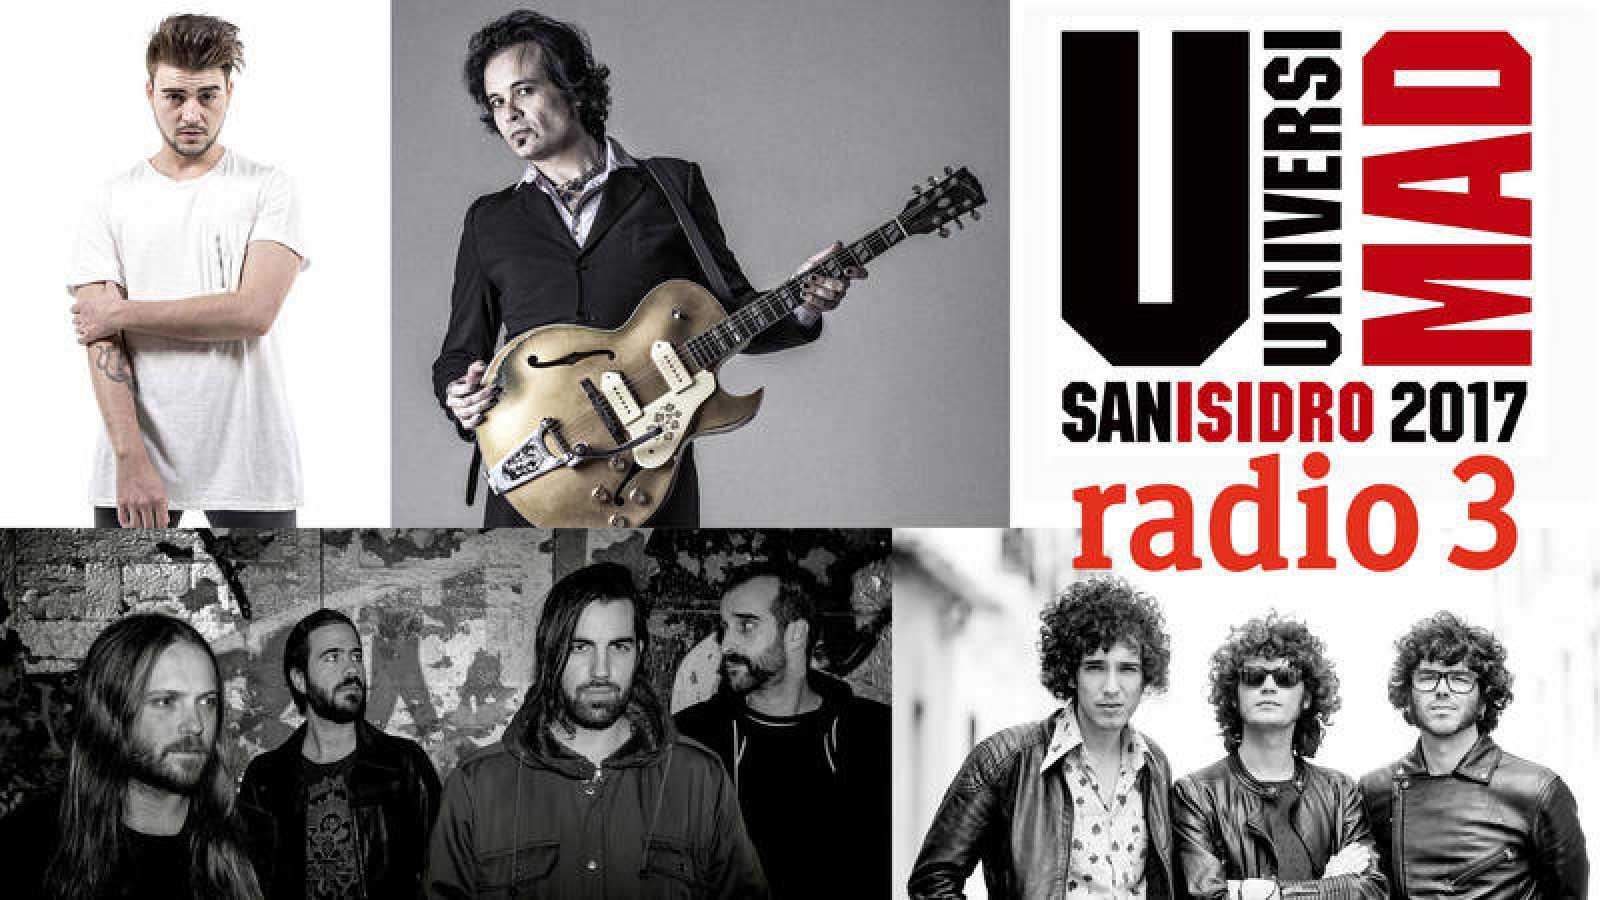 universimad 2017 radio3